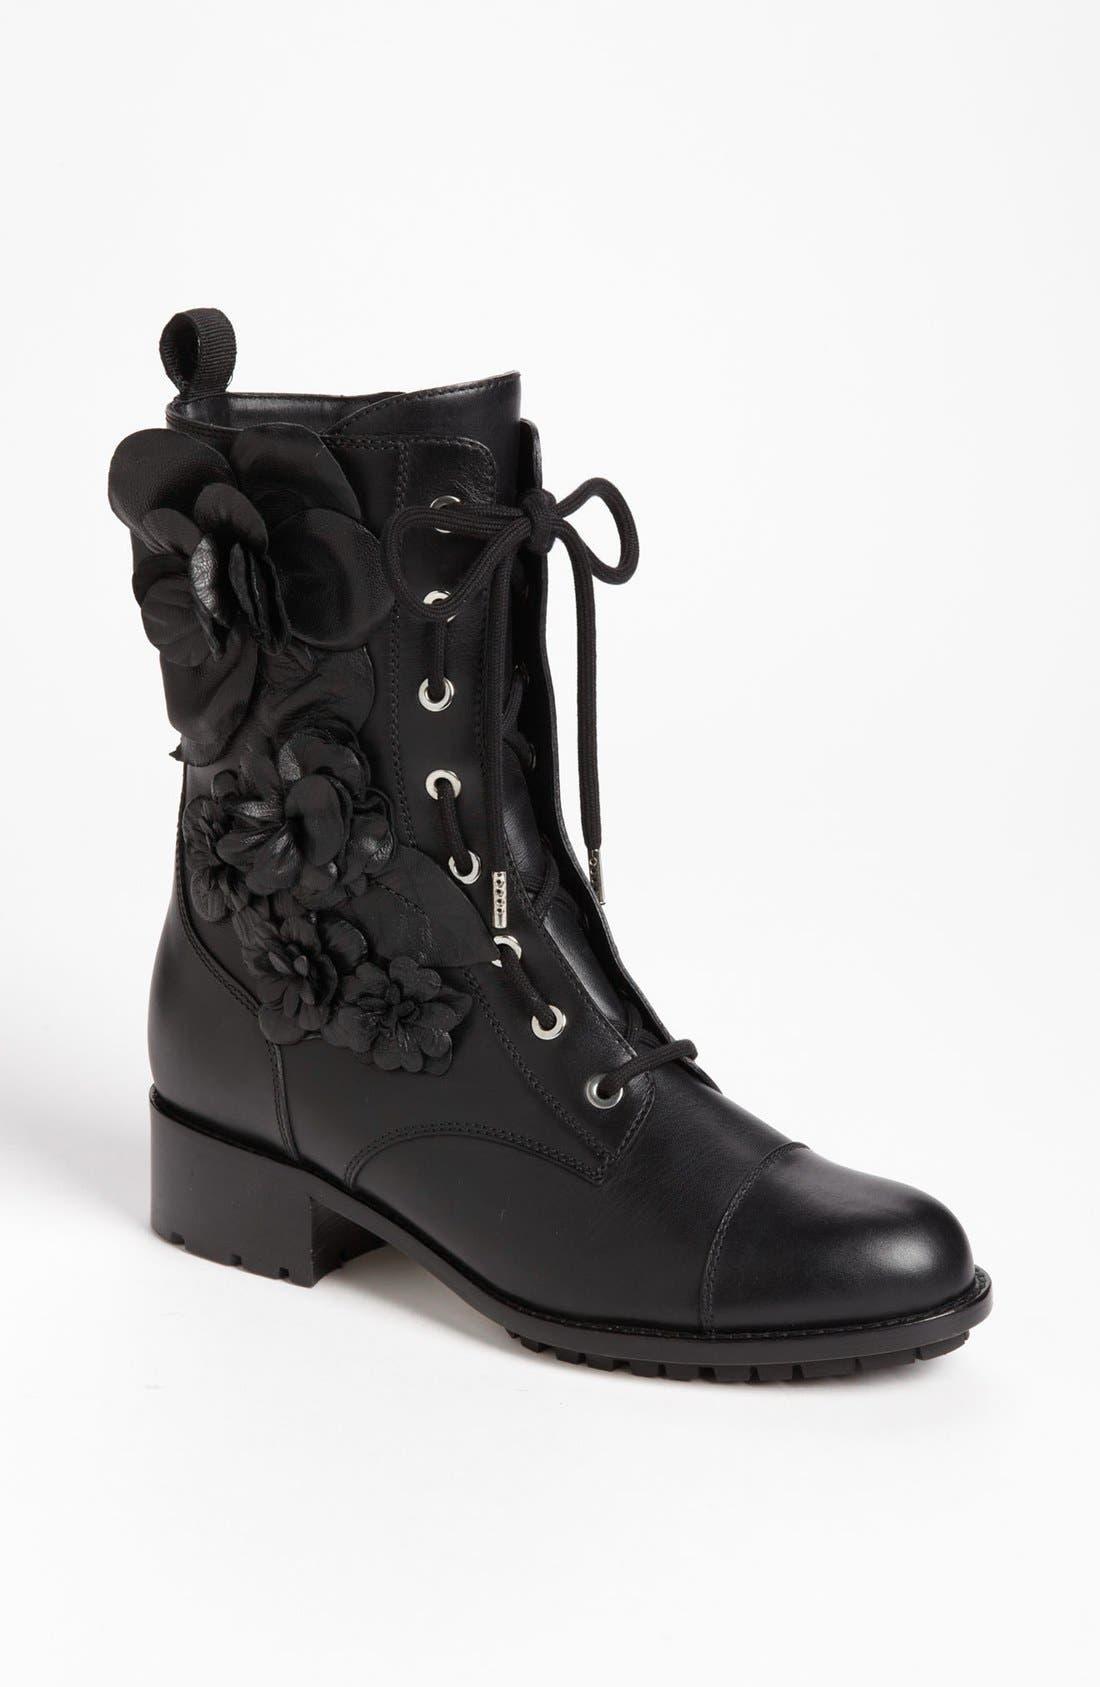 Alternate Image 1 Selected - VALENTINO GARAVANI 'Tecno Couture' Combat Boot